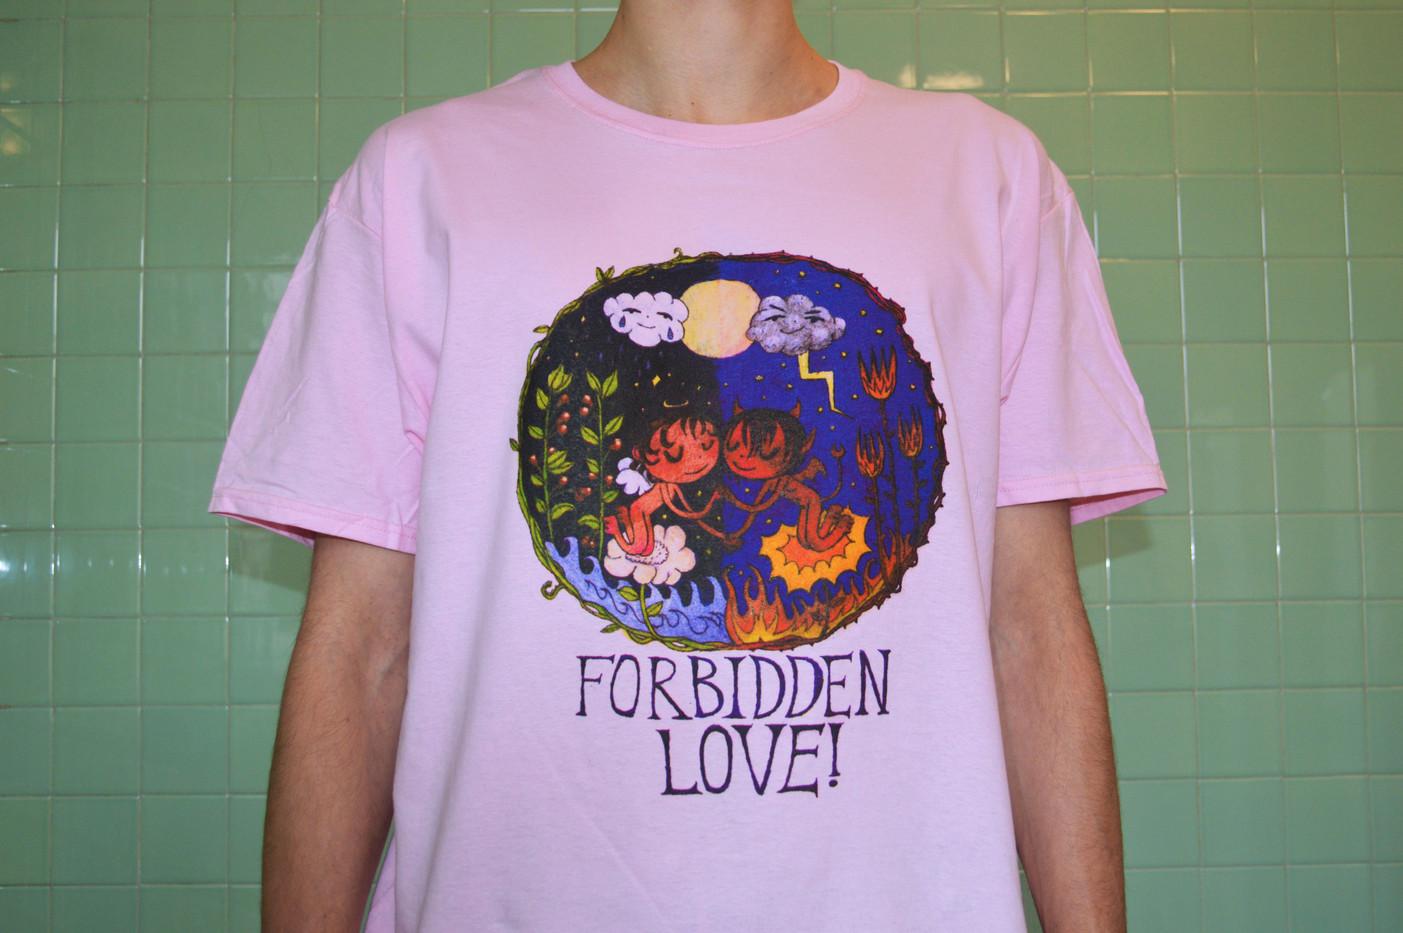 fbd_love_pink_s.jpg